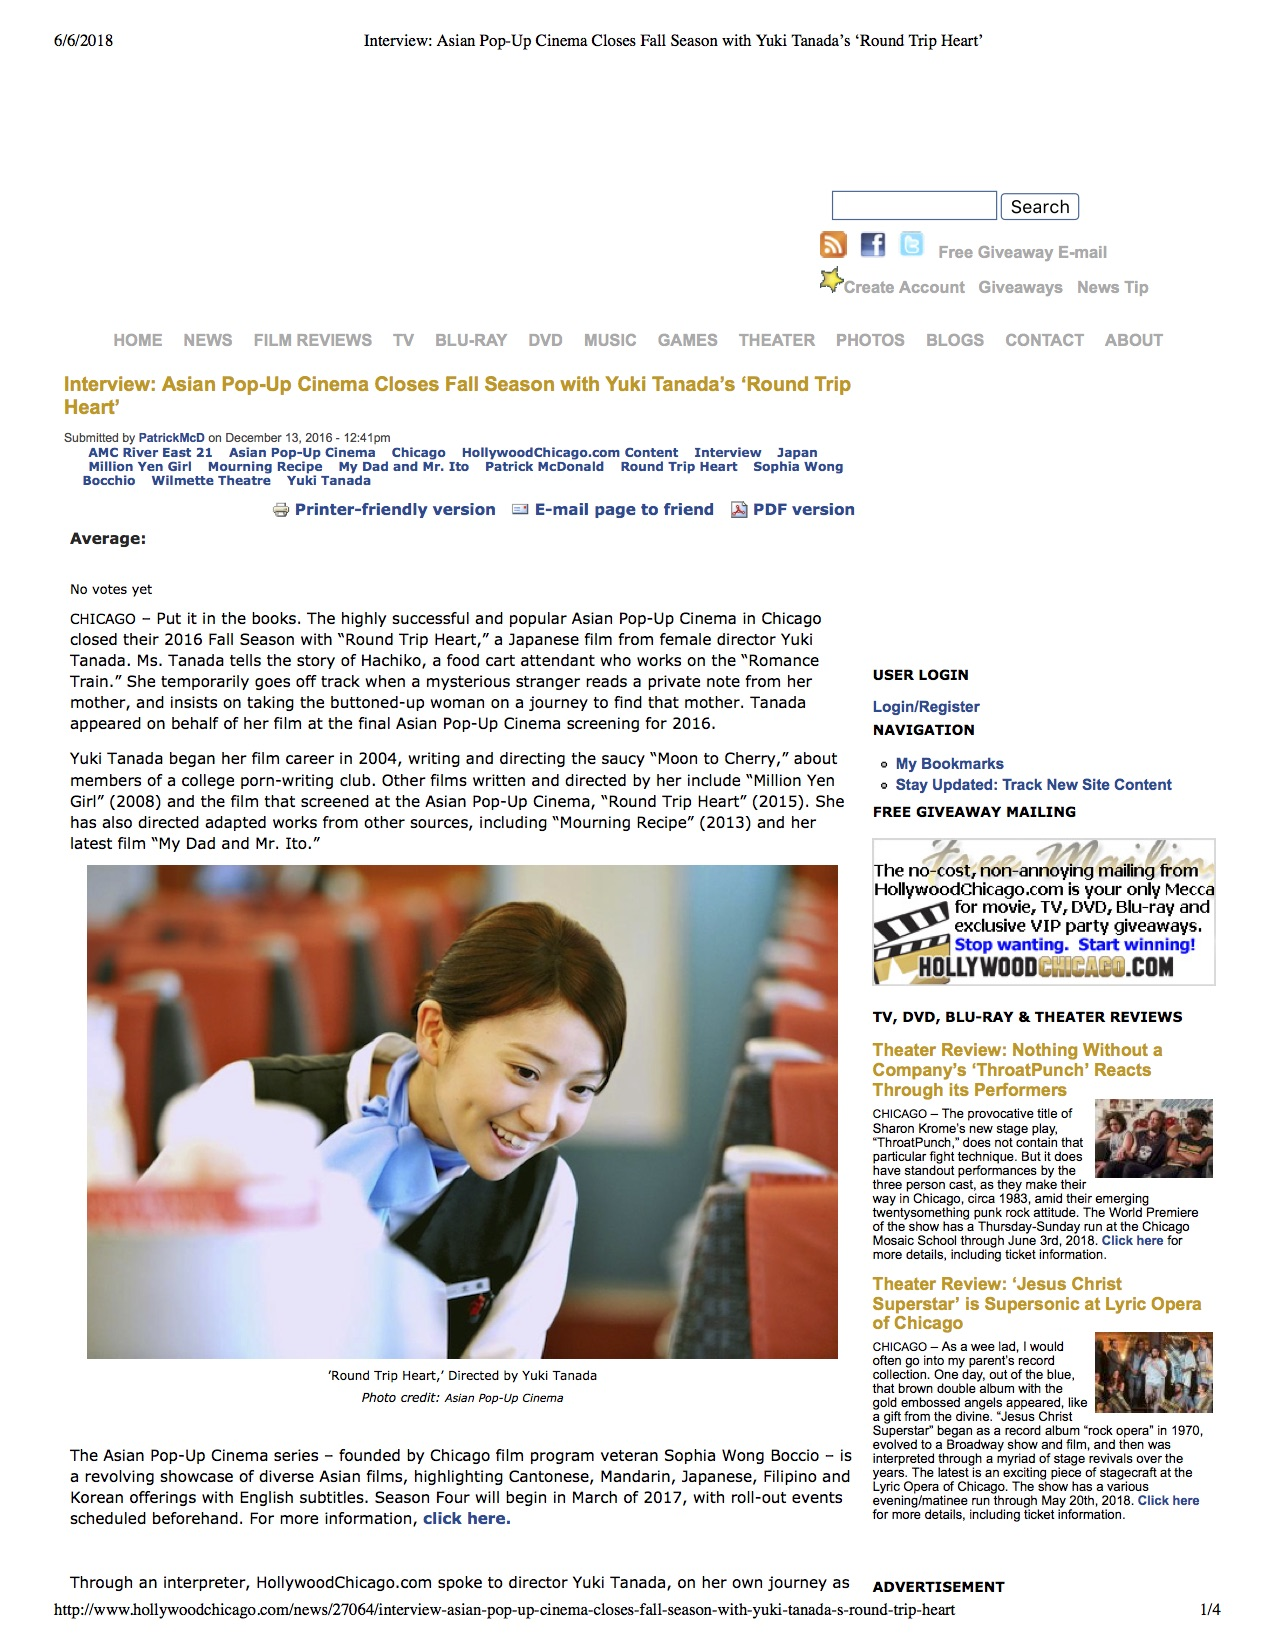 1Interview_ Asian Pop-Up Cinema Closes Fall Season with Yuki Tanada's 'Round Trip Heart'.jpg